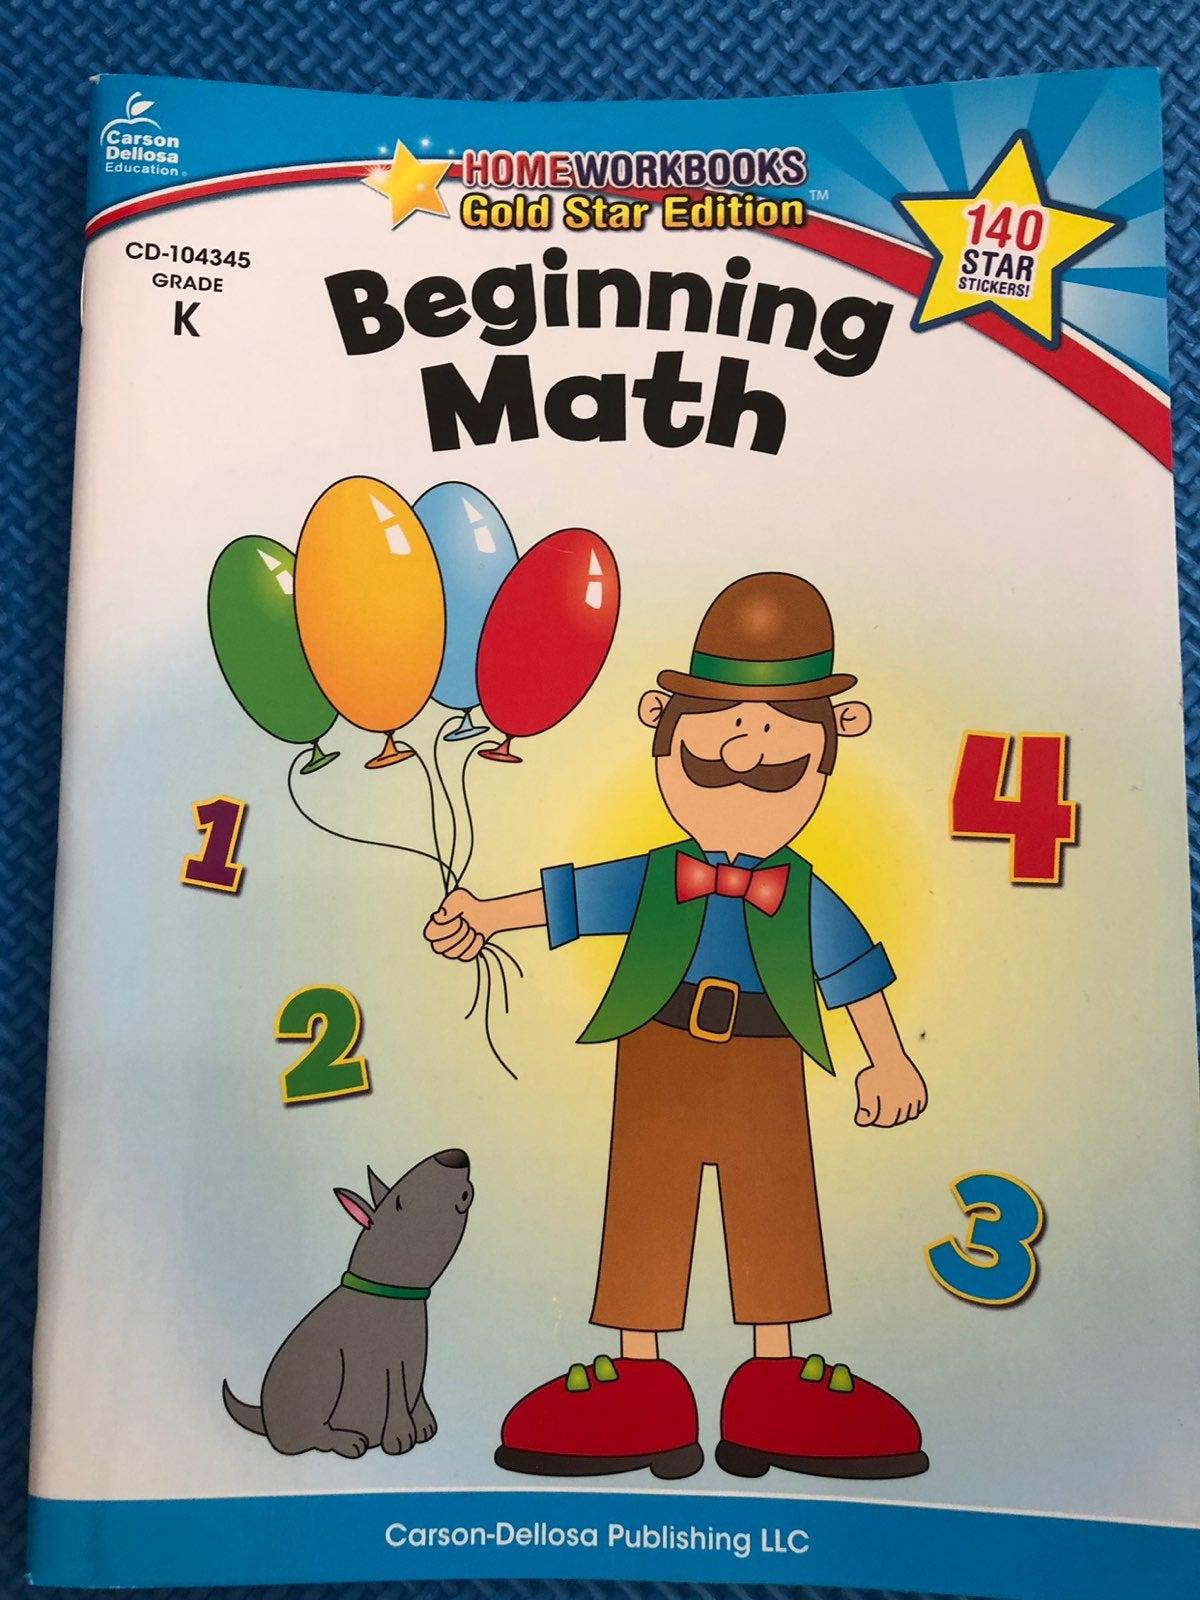 Children's books turned into CLOCKS